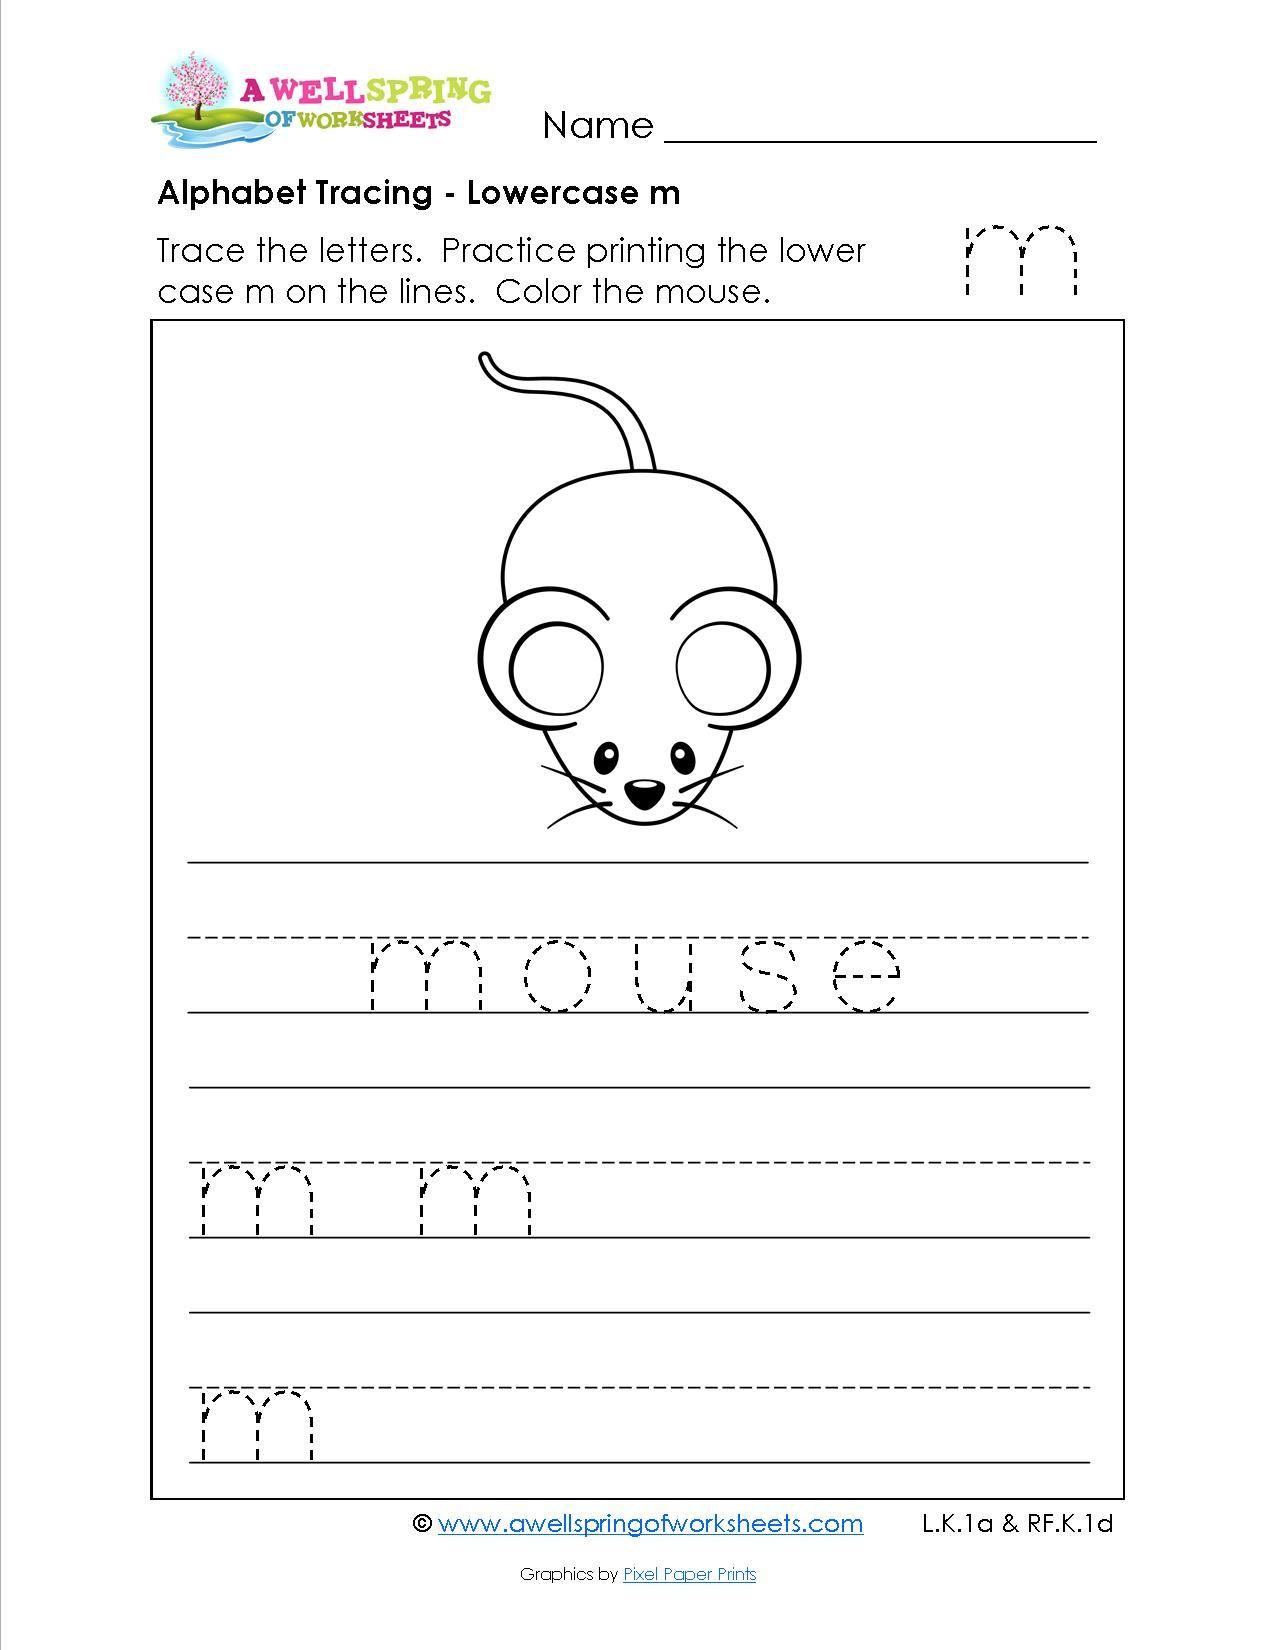 Grade Level Worksheets | Writing Practice Worksheets for Making Tracing Letters Worksheets